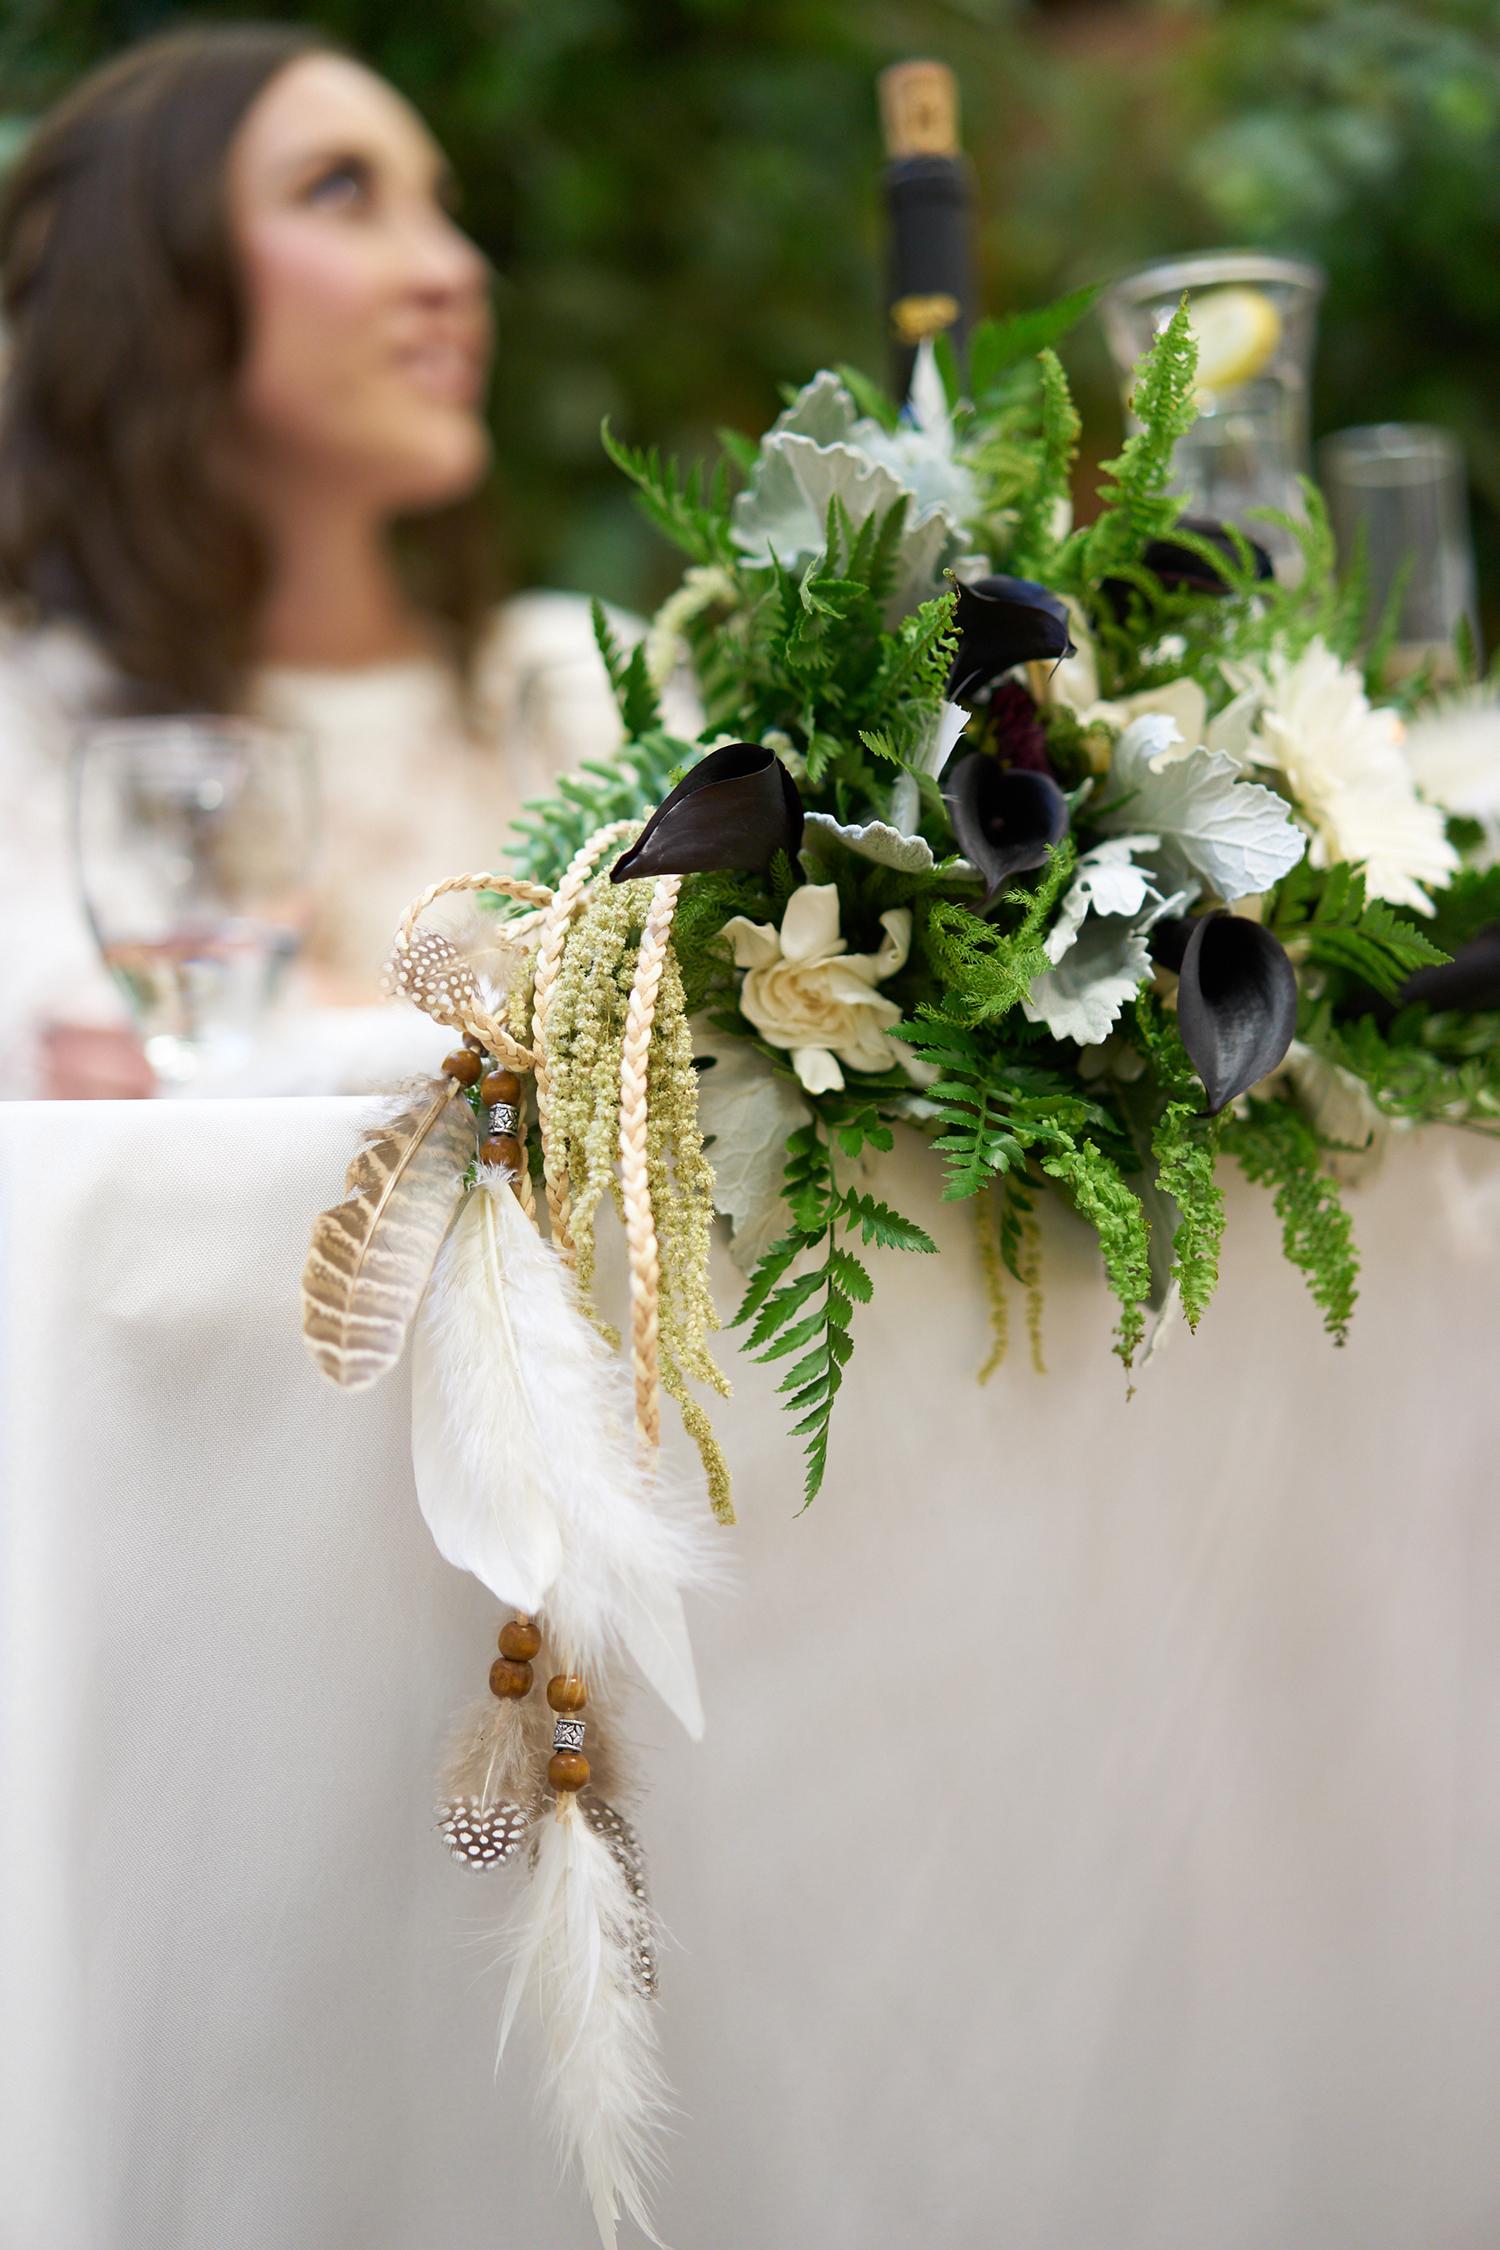 100717_Lenora_Jesse0519-weddingdress-bride-weddingphotography-best-weddingphotographer-bridal-groom-wedding-engagementring-proposal-brides-diamondring-sonyalpha-sony-sonya7rii-sanfrancisco-sf-bayarea-photographer-profoto-berkeley-botanical-garden.jpg